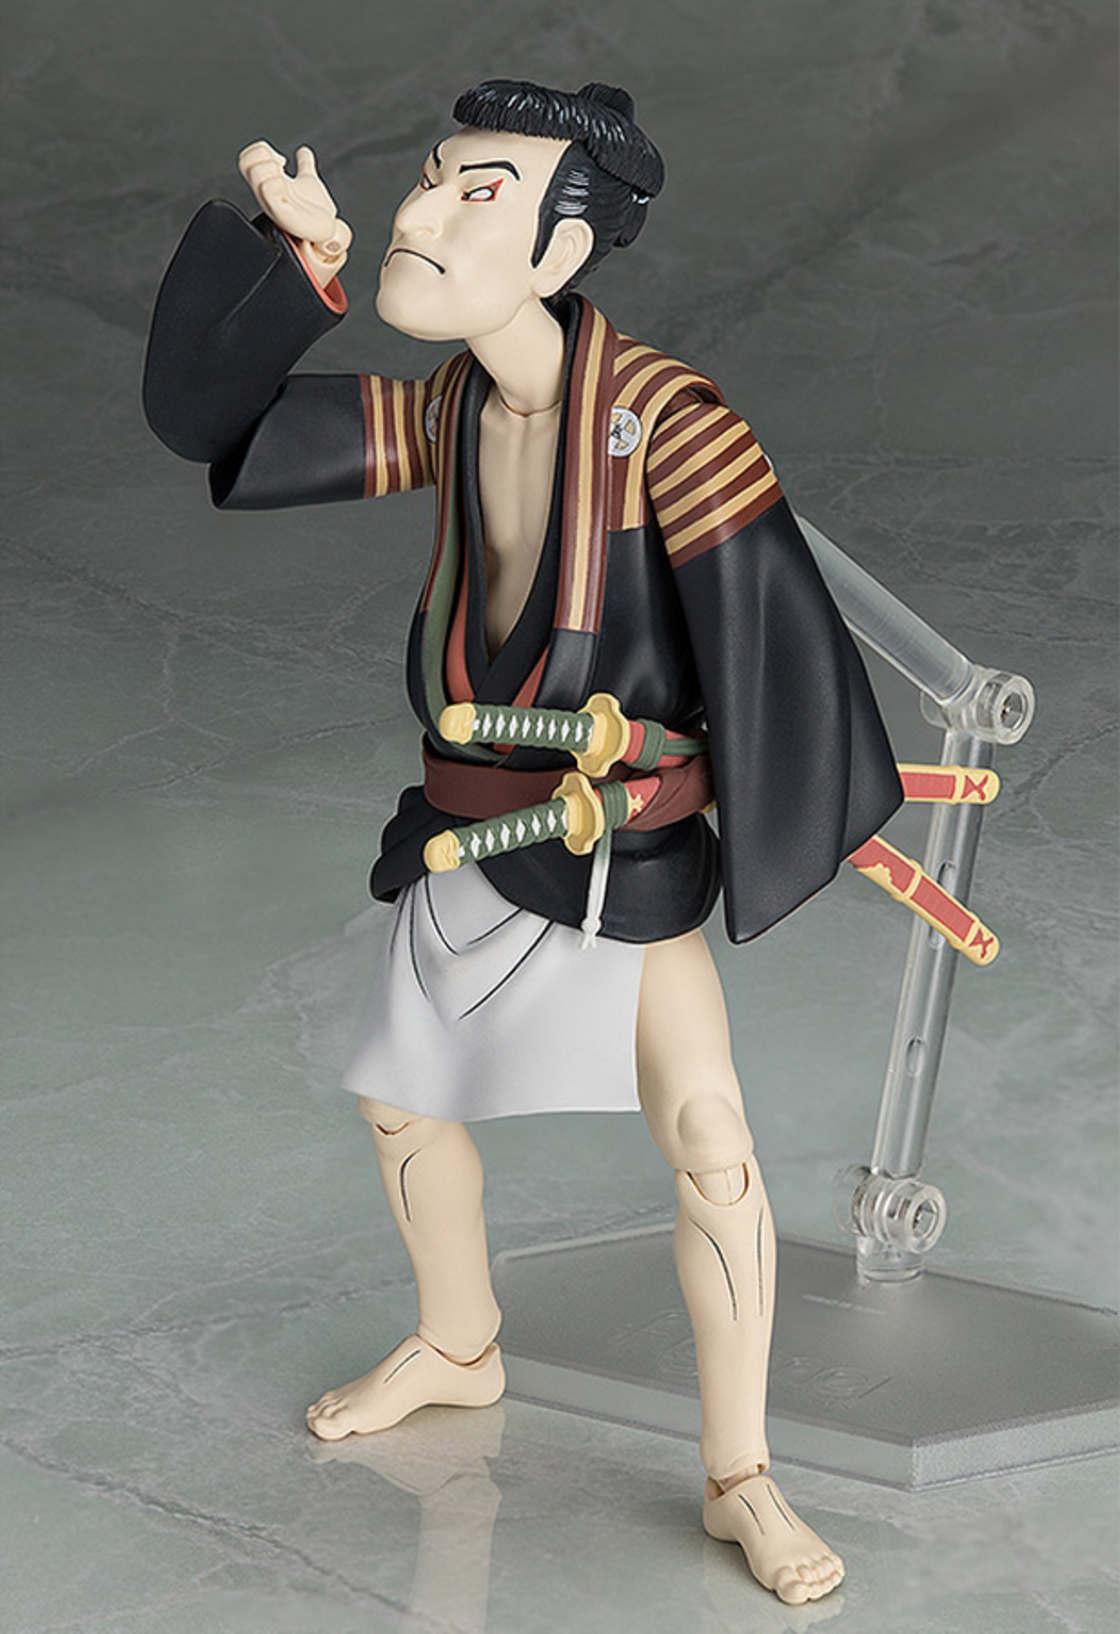 Yakko Edobei - The famous Japanese print becomes a figurine!